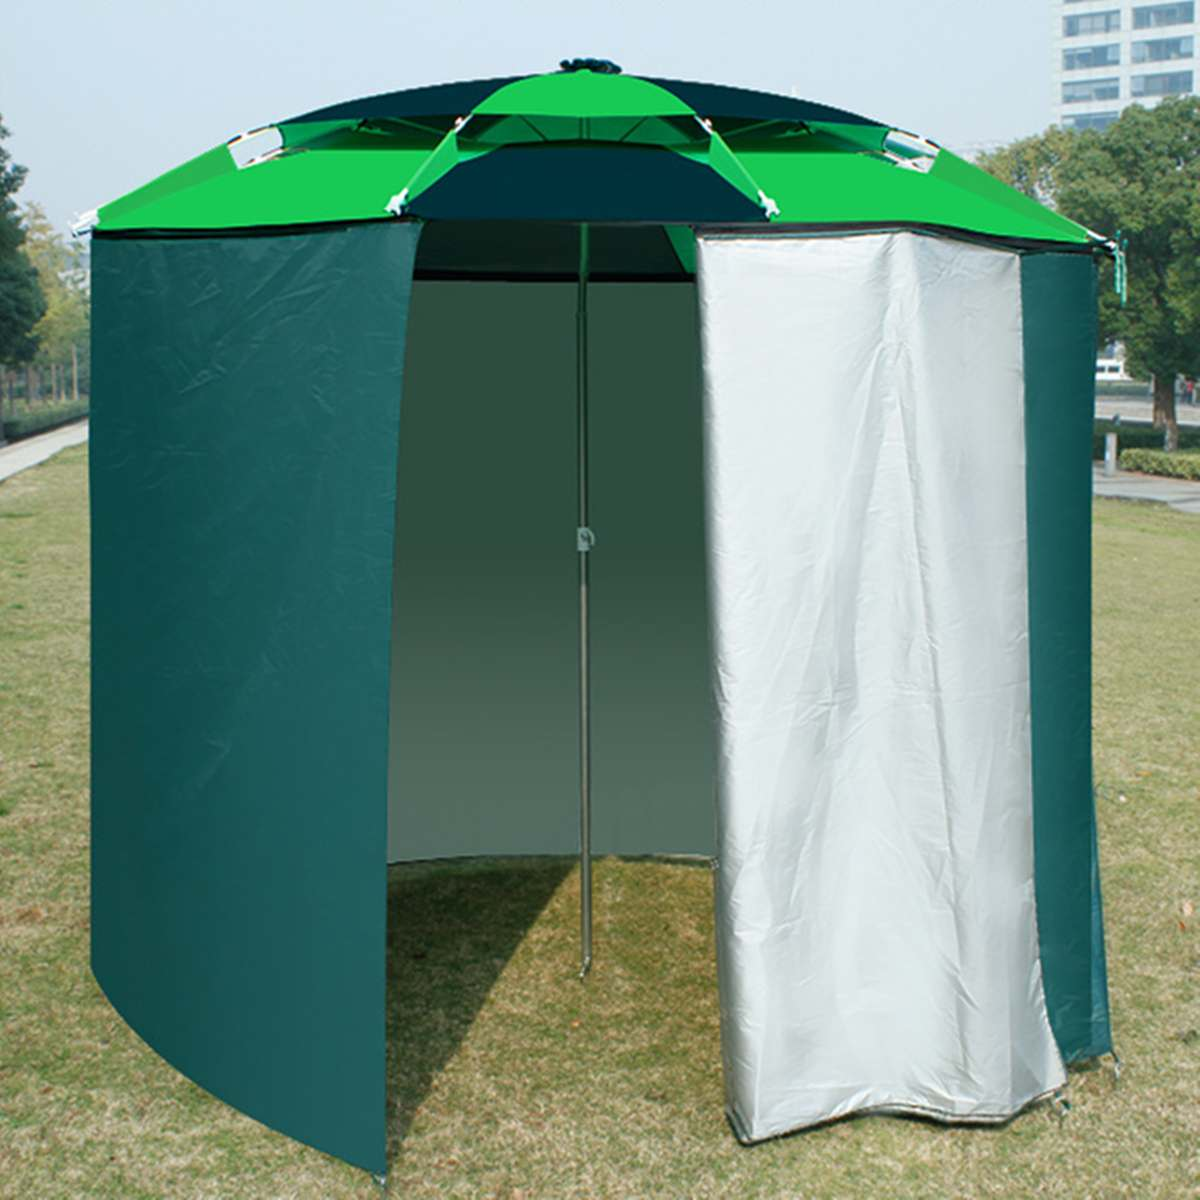 220cm Fishing Umbrella Outdoor Fastener Universal Garden Umbrella Beach Sunshade Rainproof Sunscreen Shelter All Round Tent